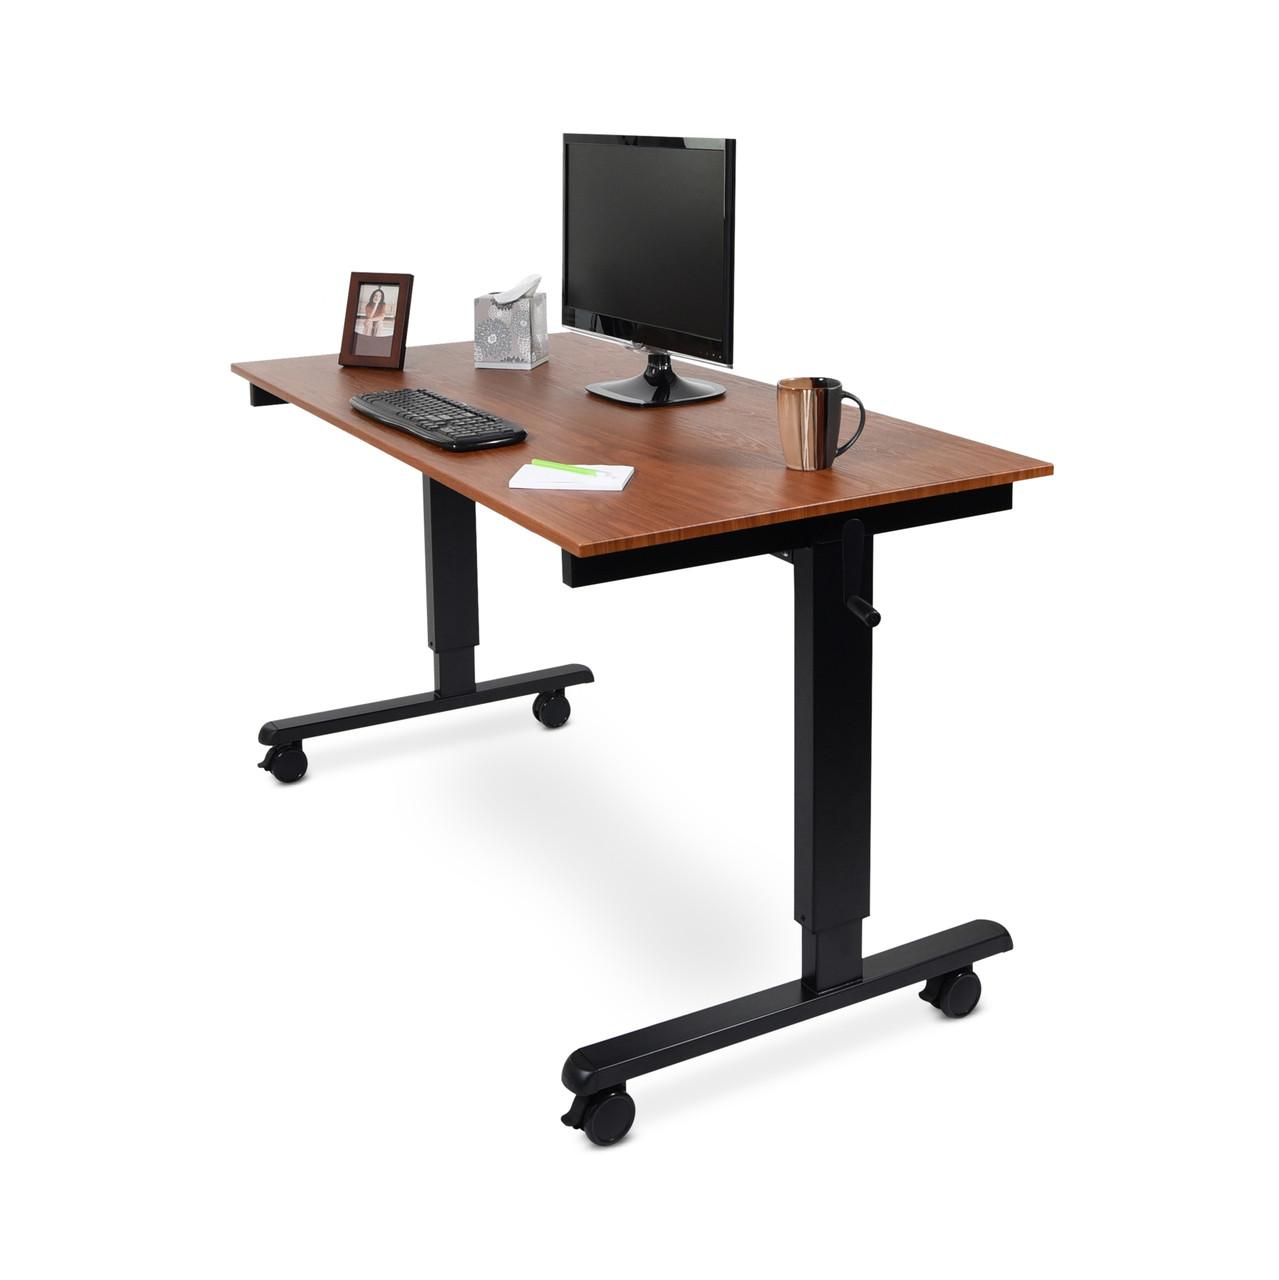 60w crank adjustable stand up desk teak